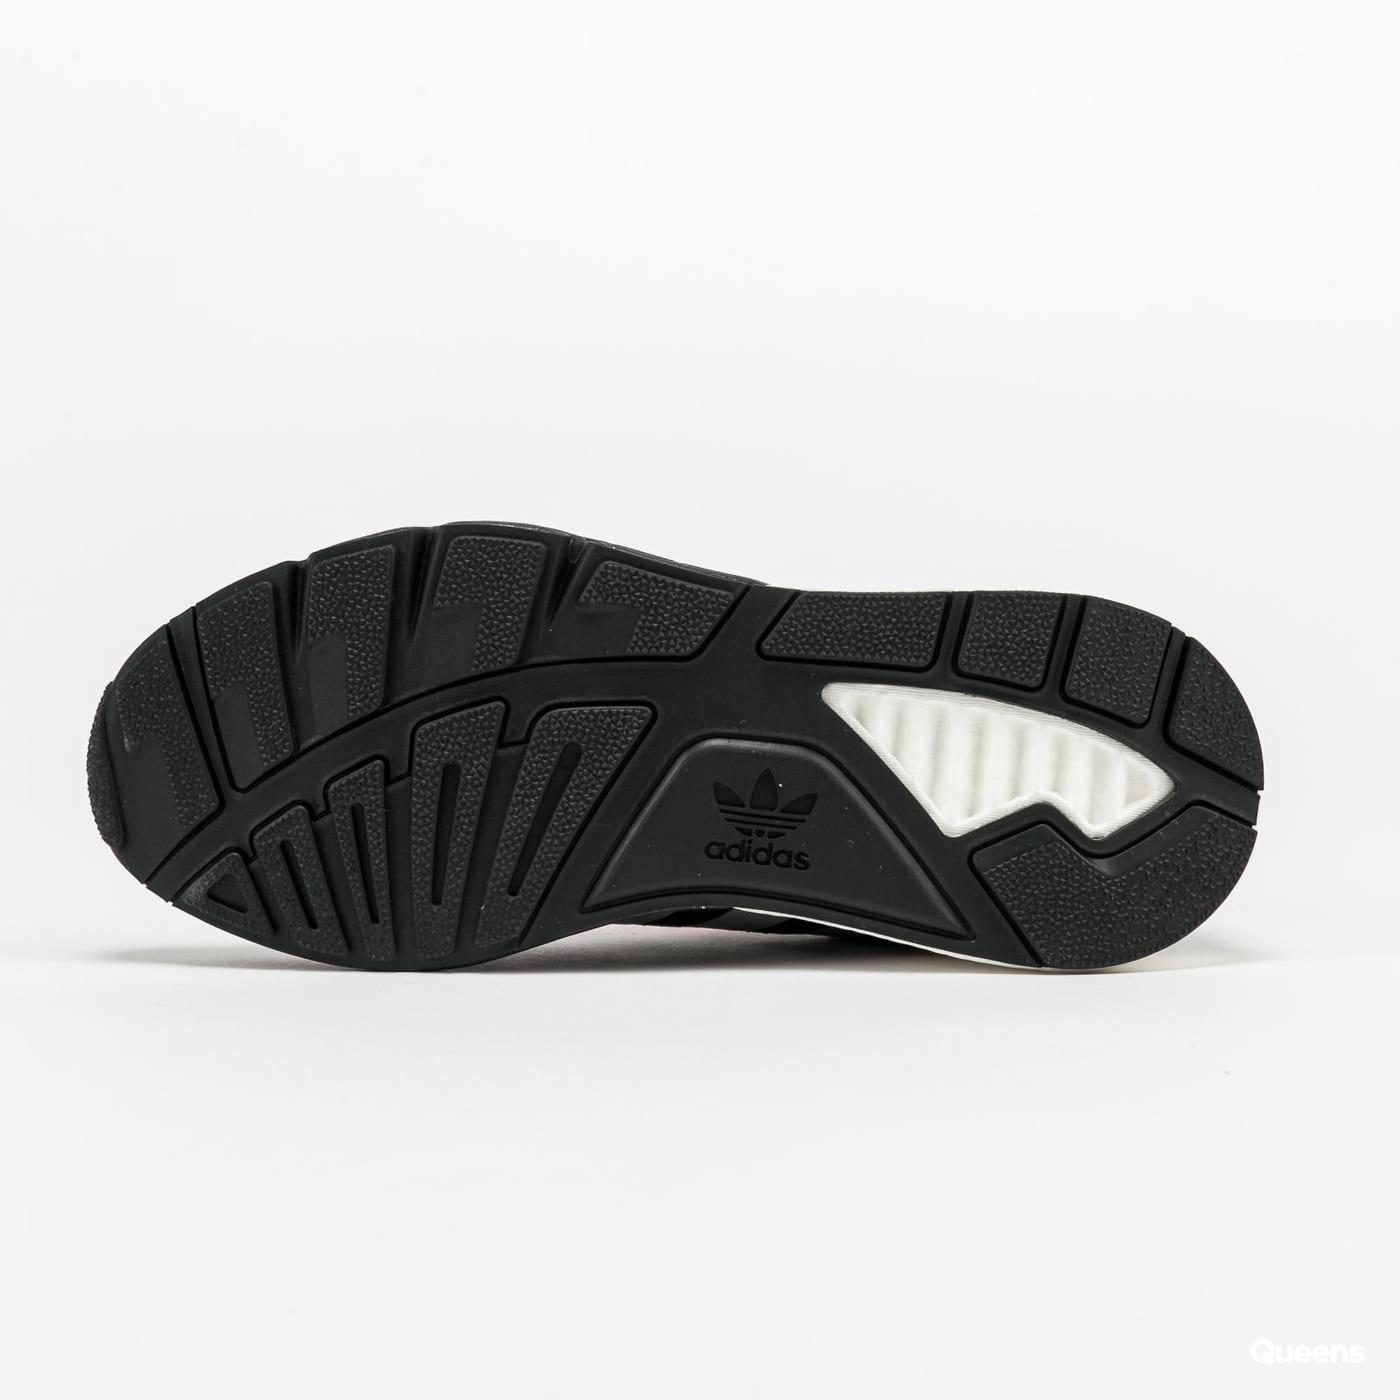 adidas Originals ZX 1K Boost core black / silver metallic / cloud white